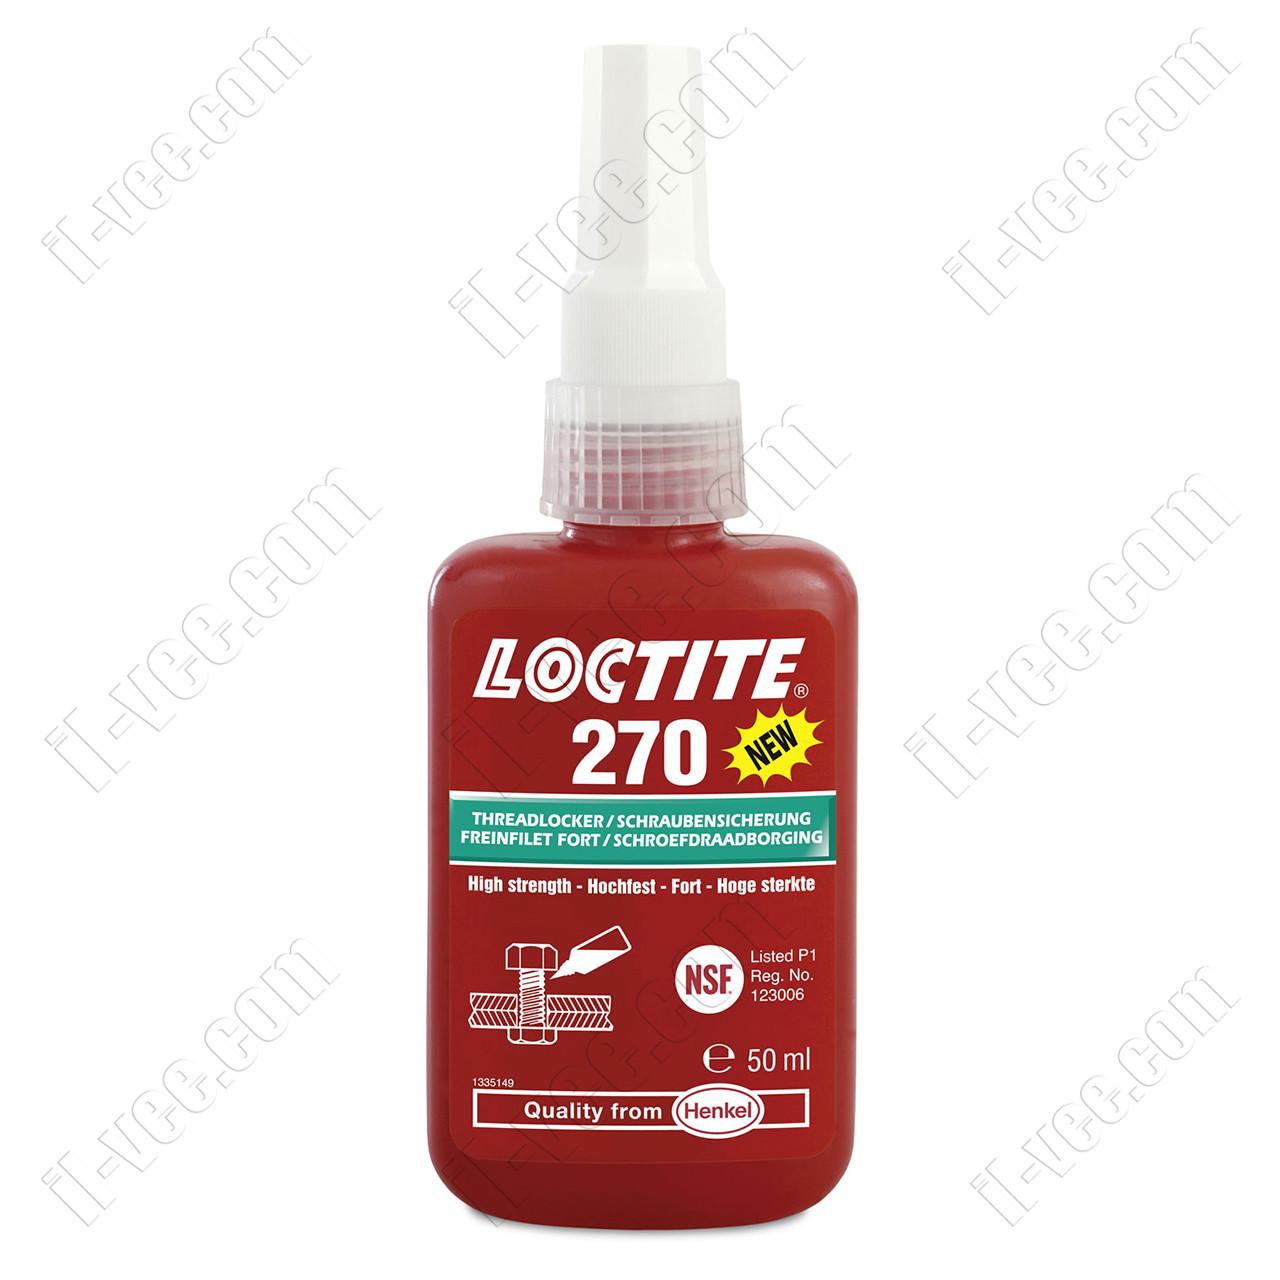 Резьбовой фиксатор Loctite 270, 50мл